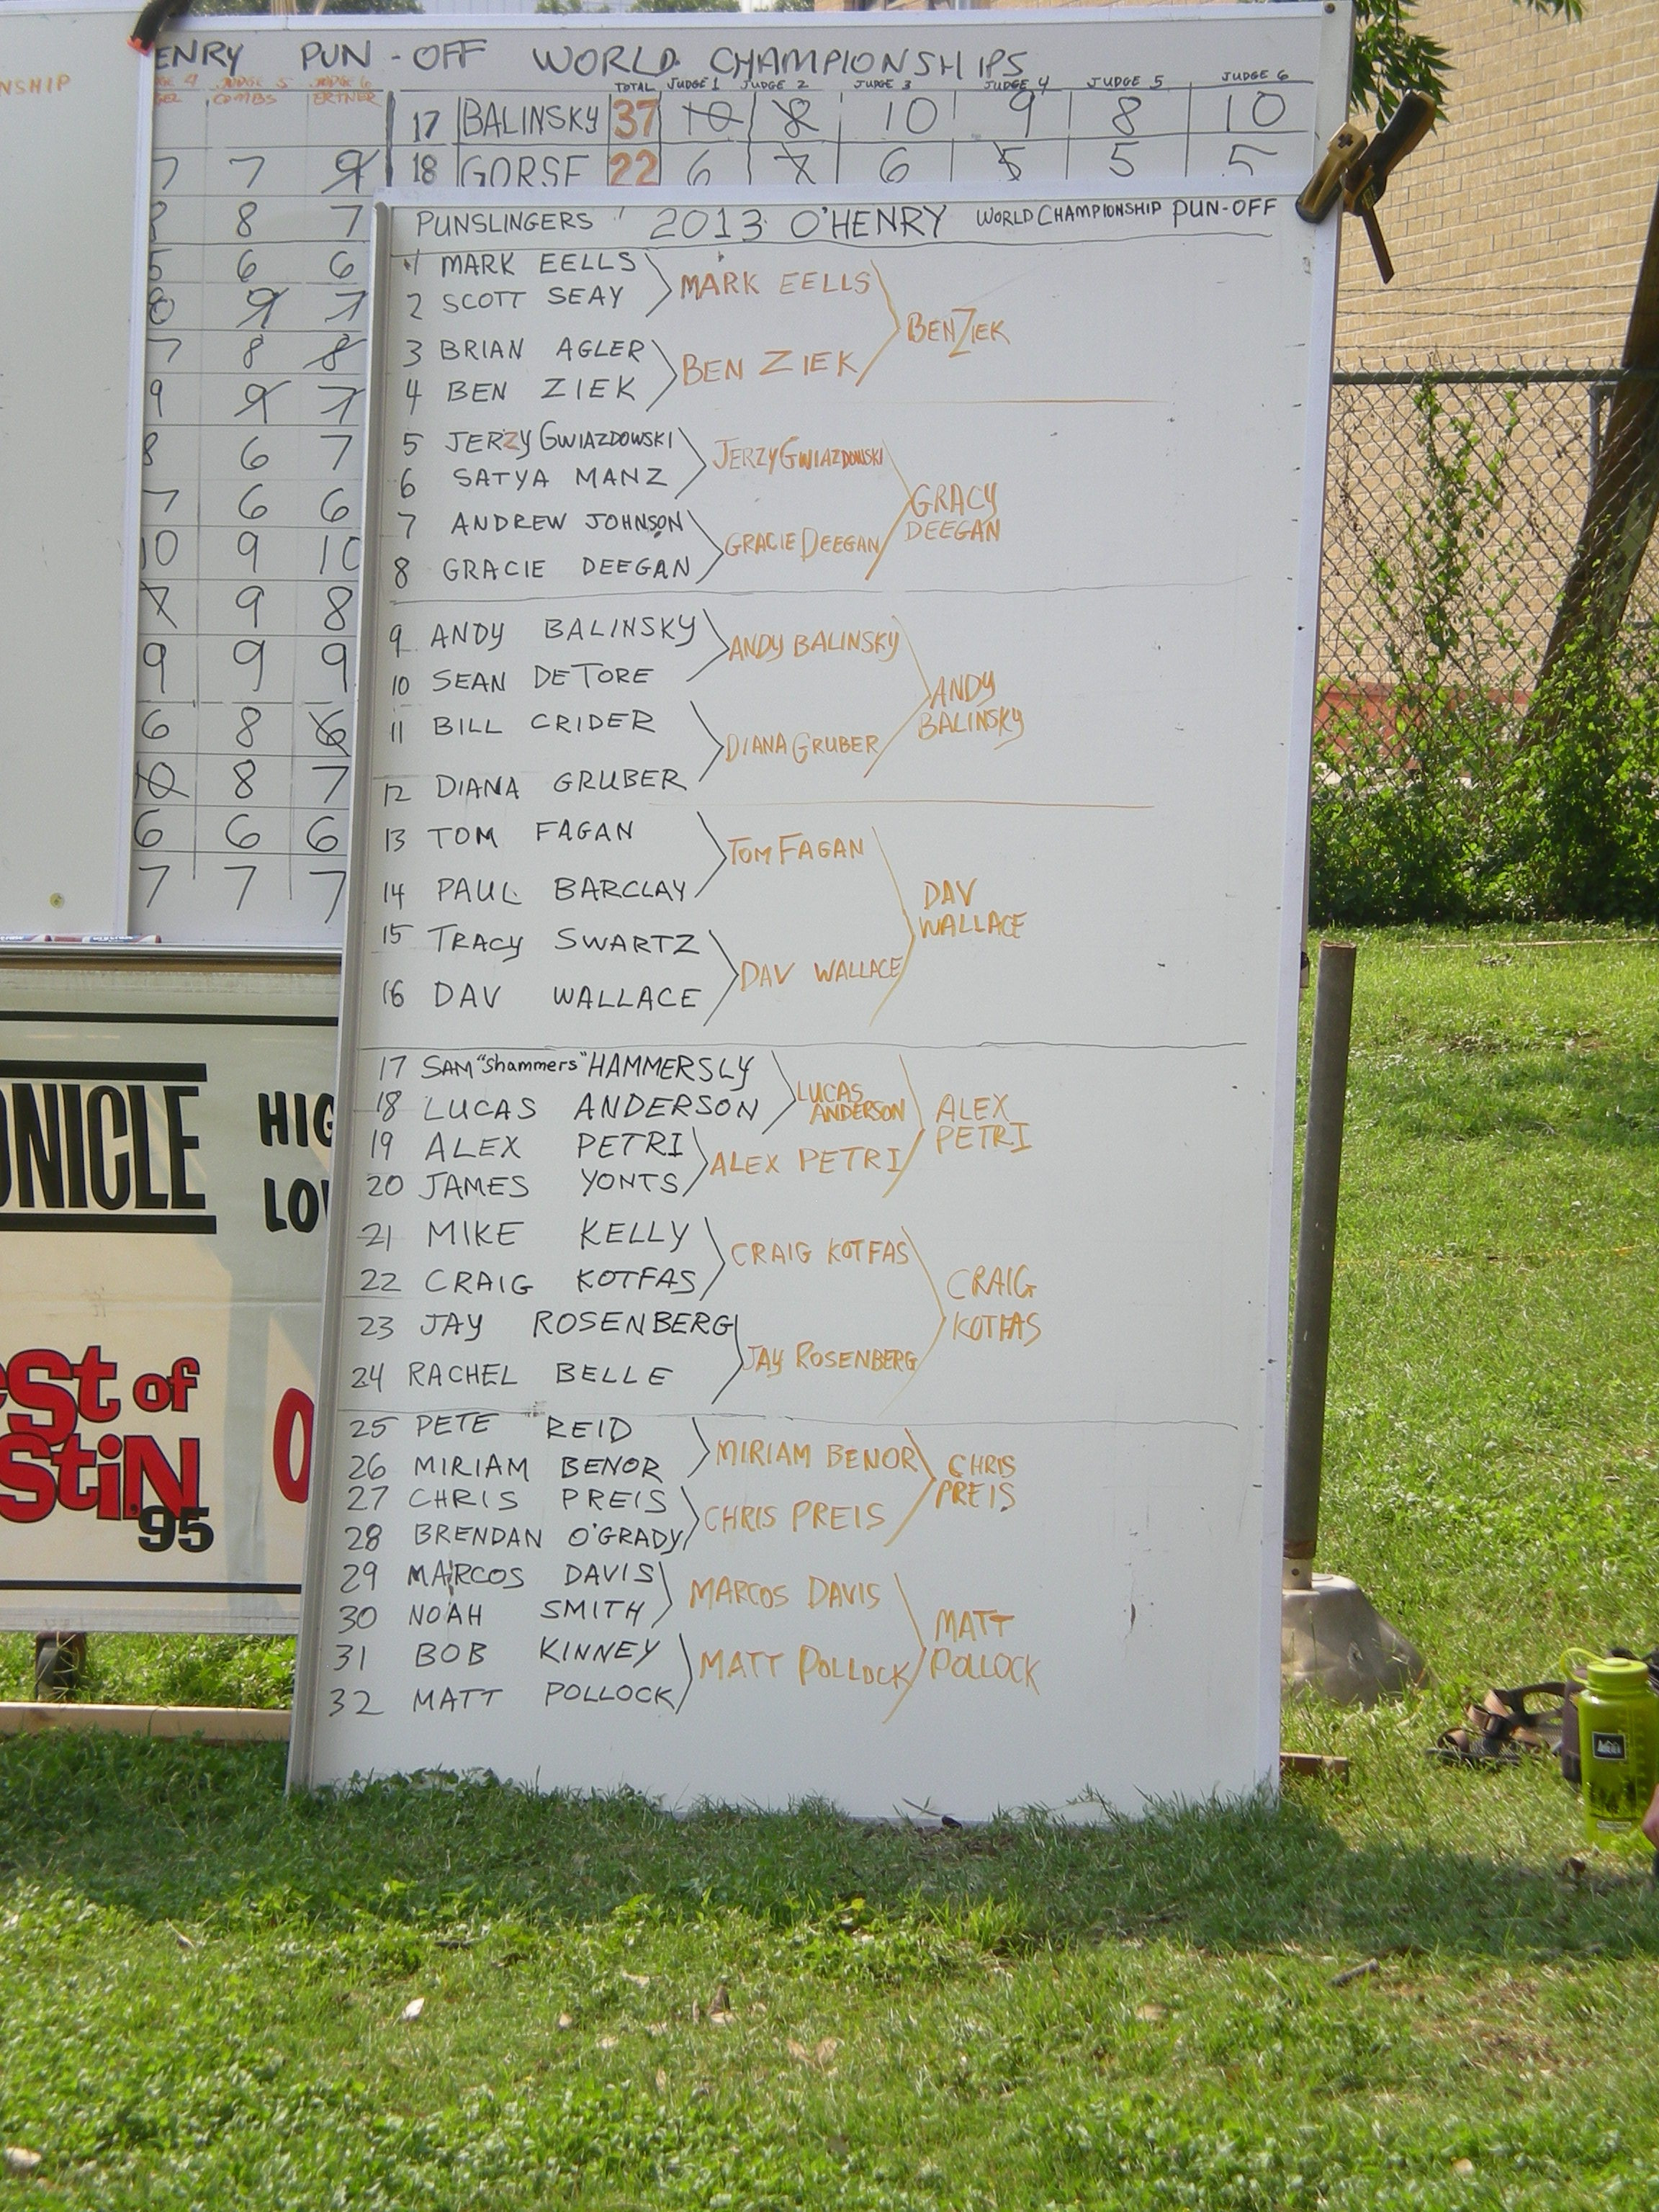 Pun-Off Scoreboard